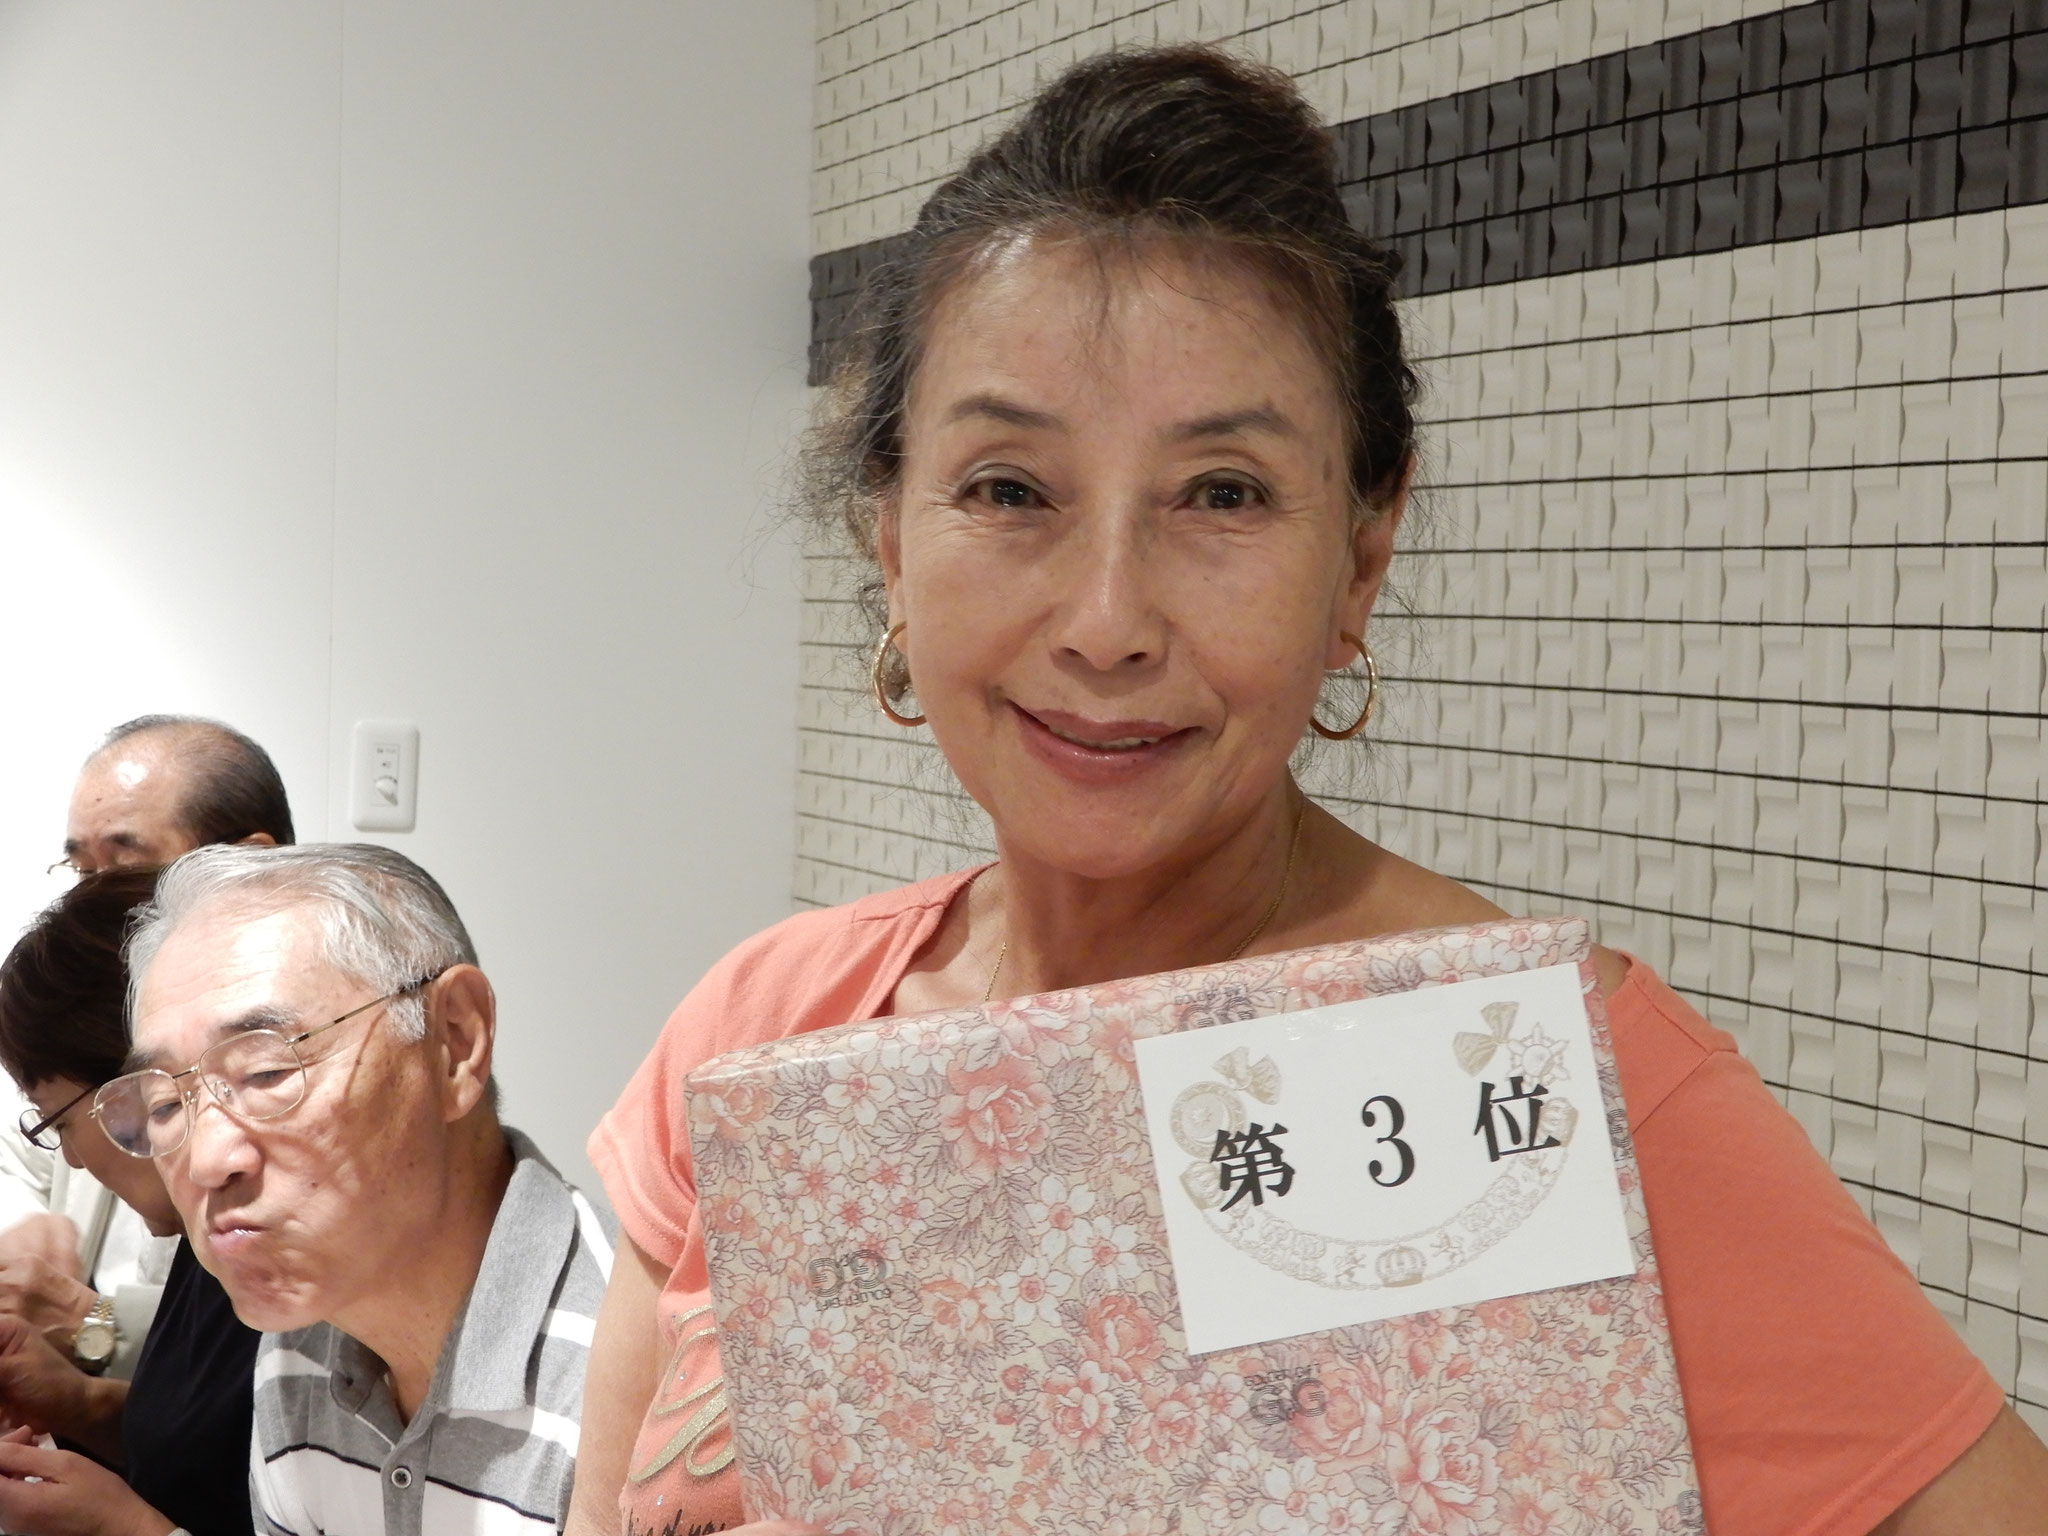 3位: <小宮幸恵> 前会長の実力発揮か?